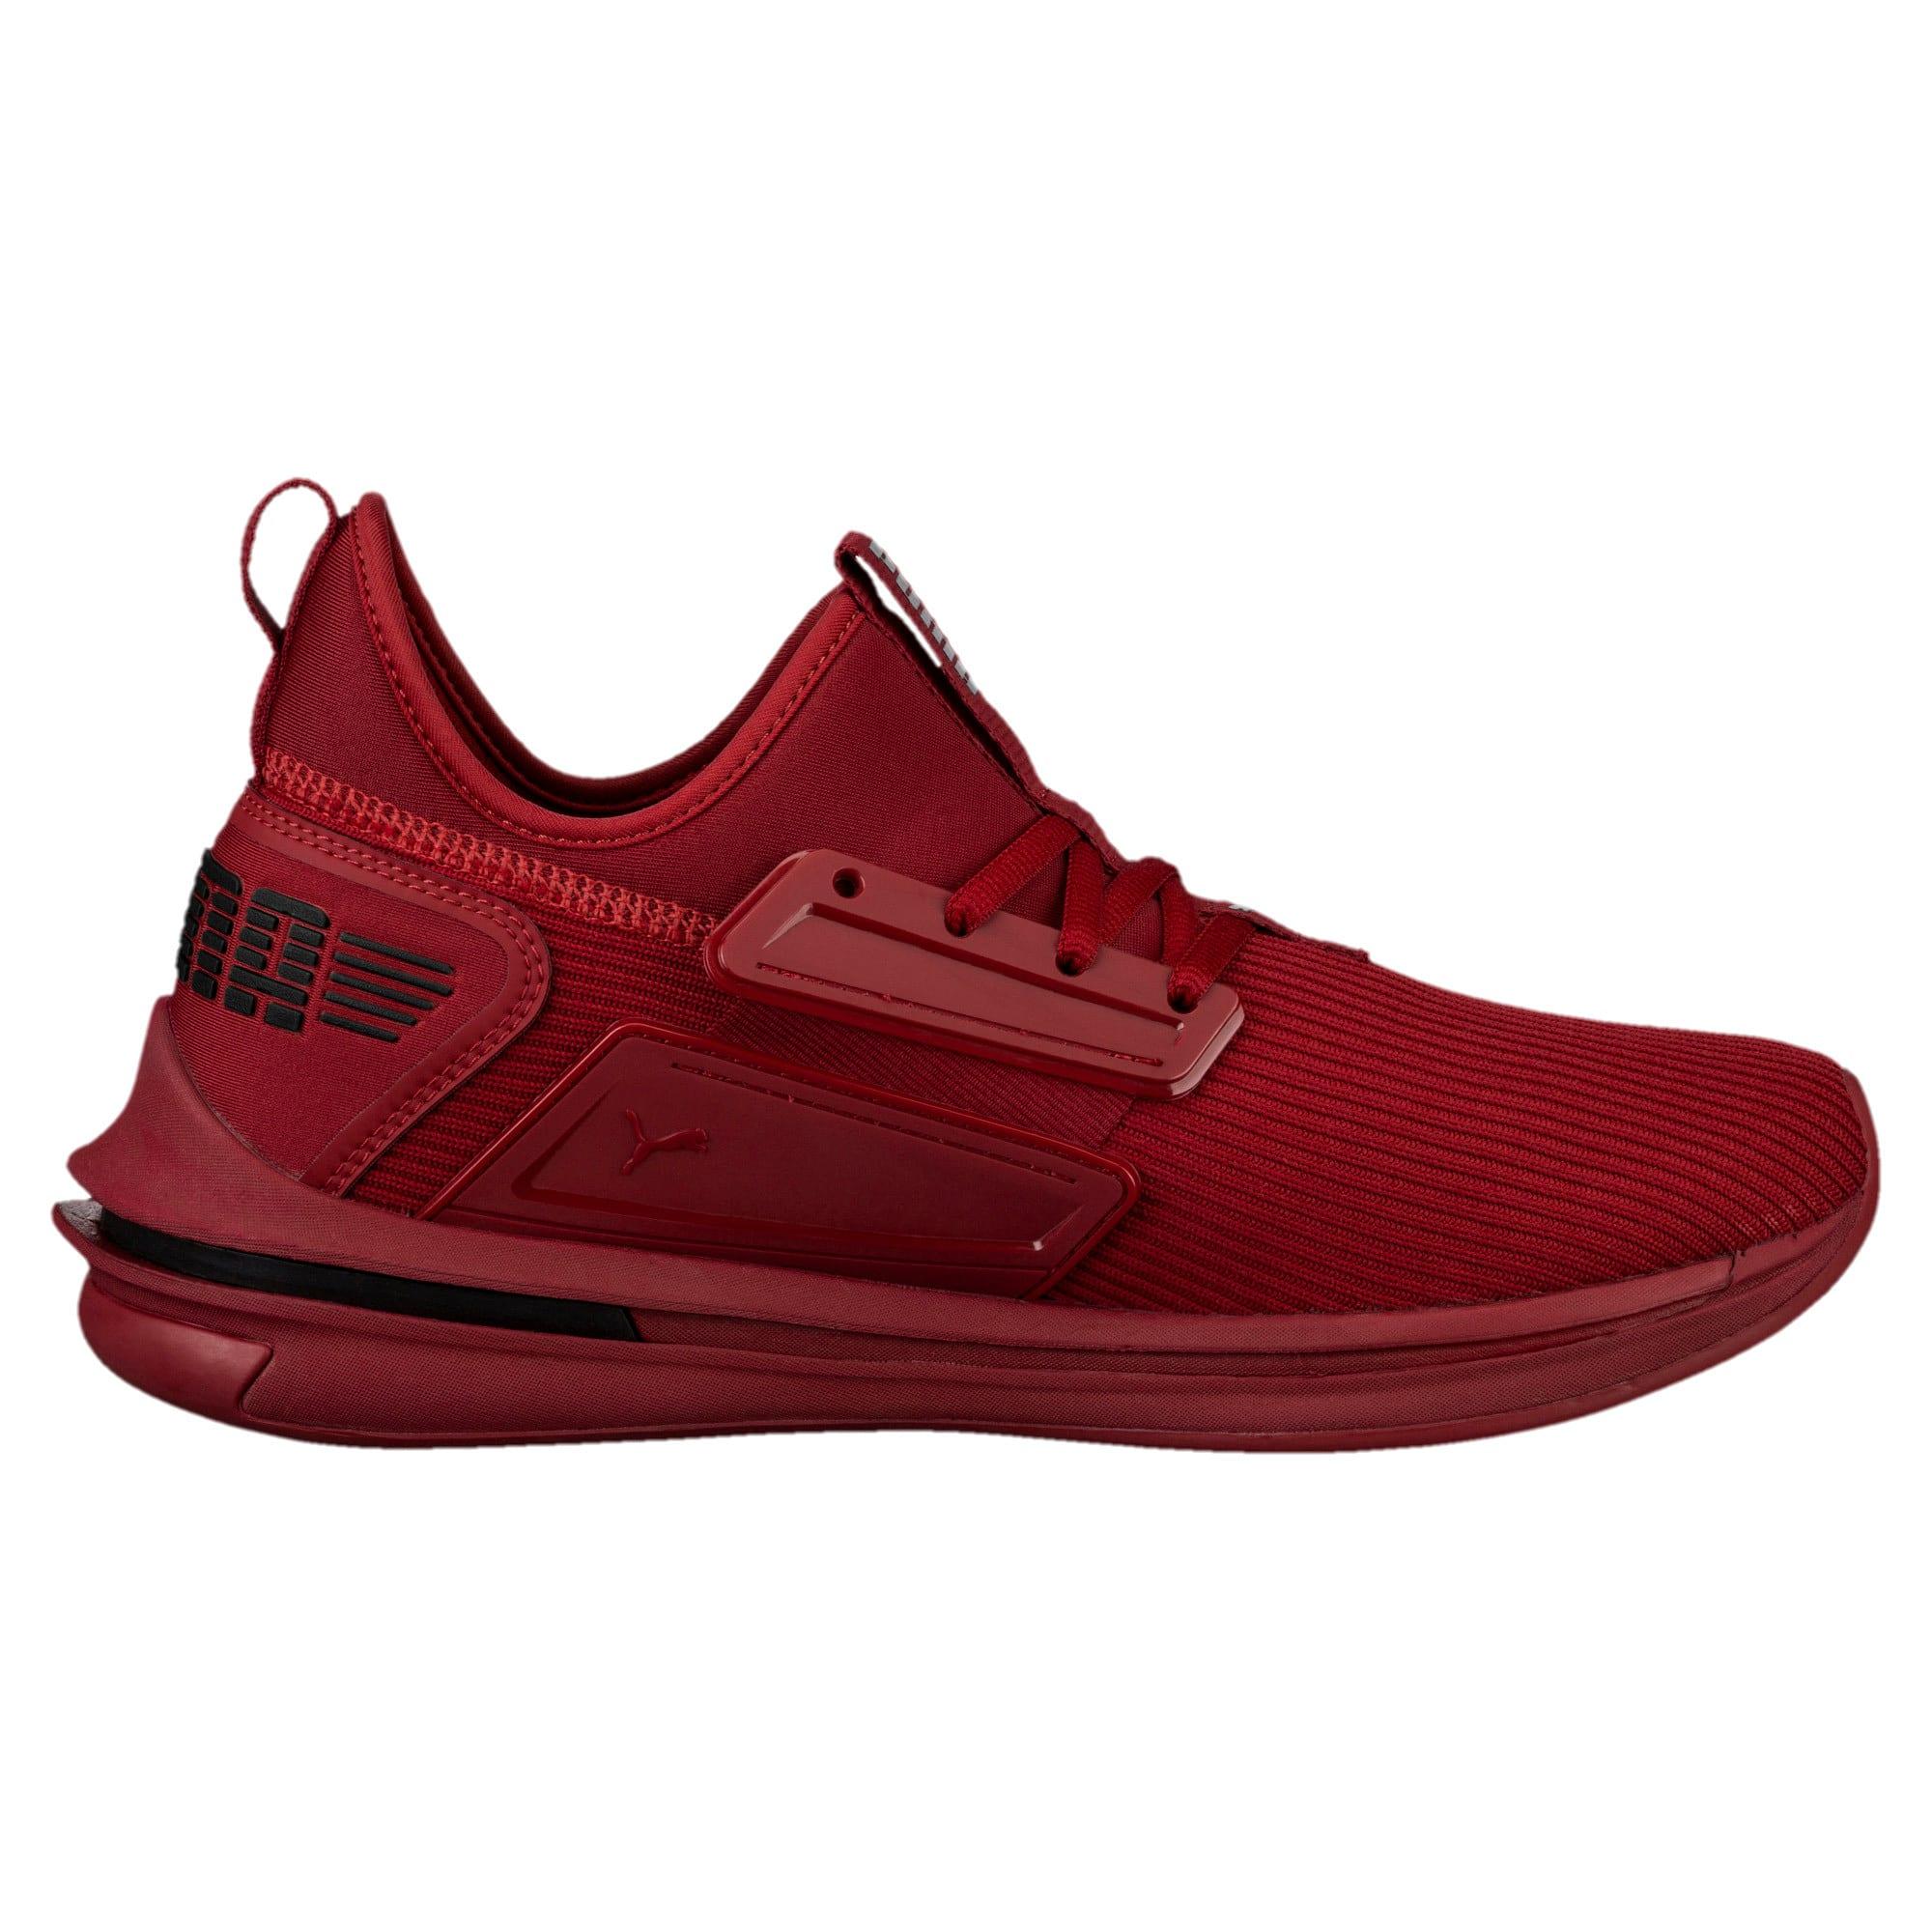 Thumbnail 3 of IGNITE Limitless SR Men's Running Shoes, Red Dahlia, medium